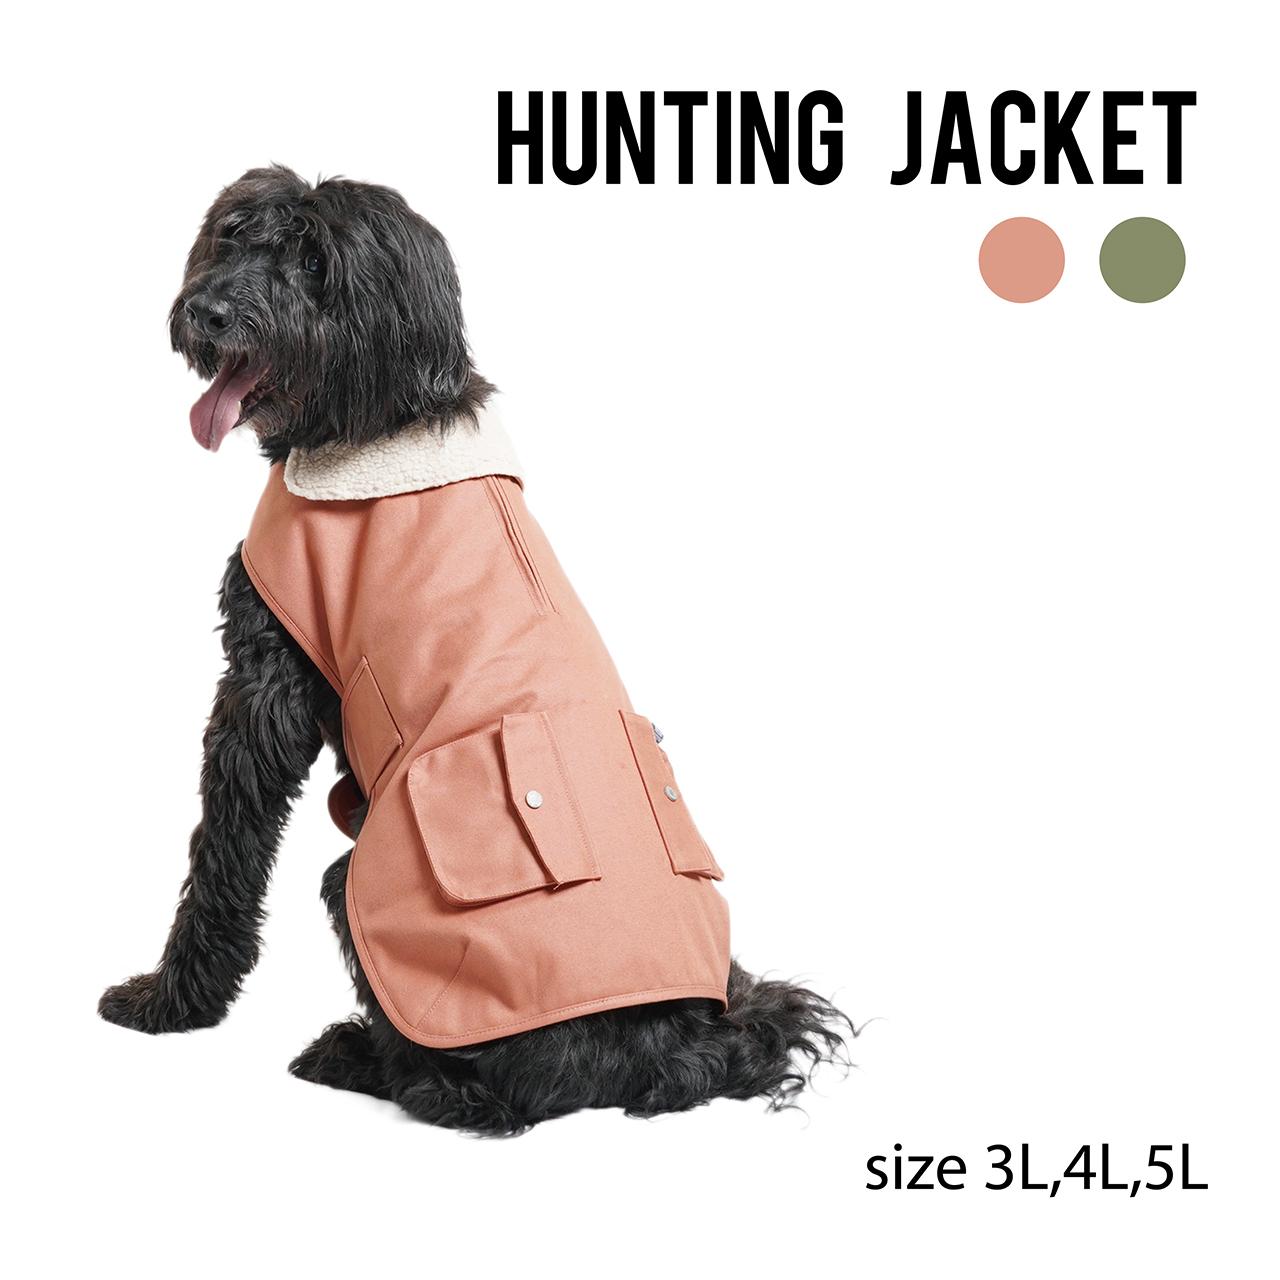 HUNTING JACKET(3L,4L,5L) ハンティングジャケット